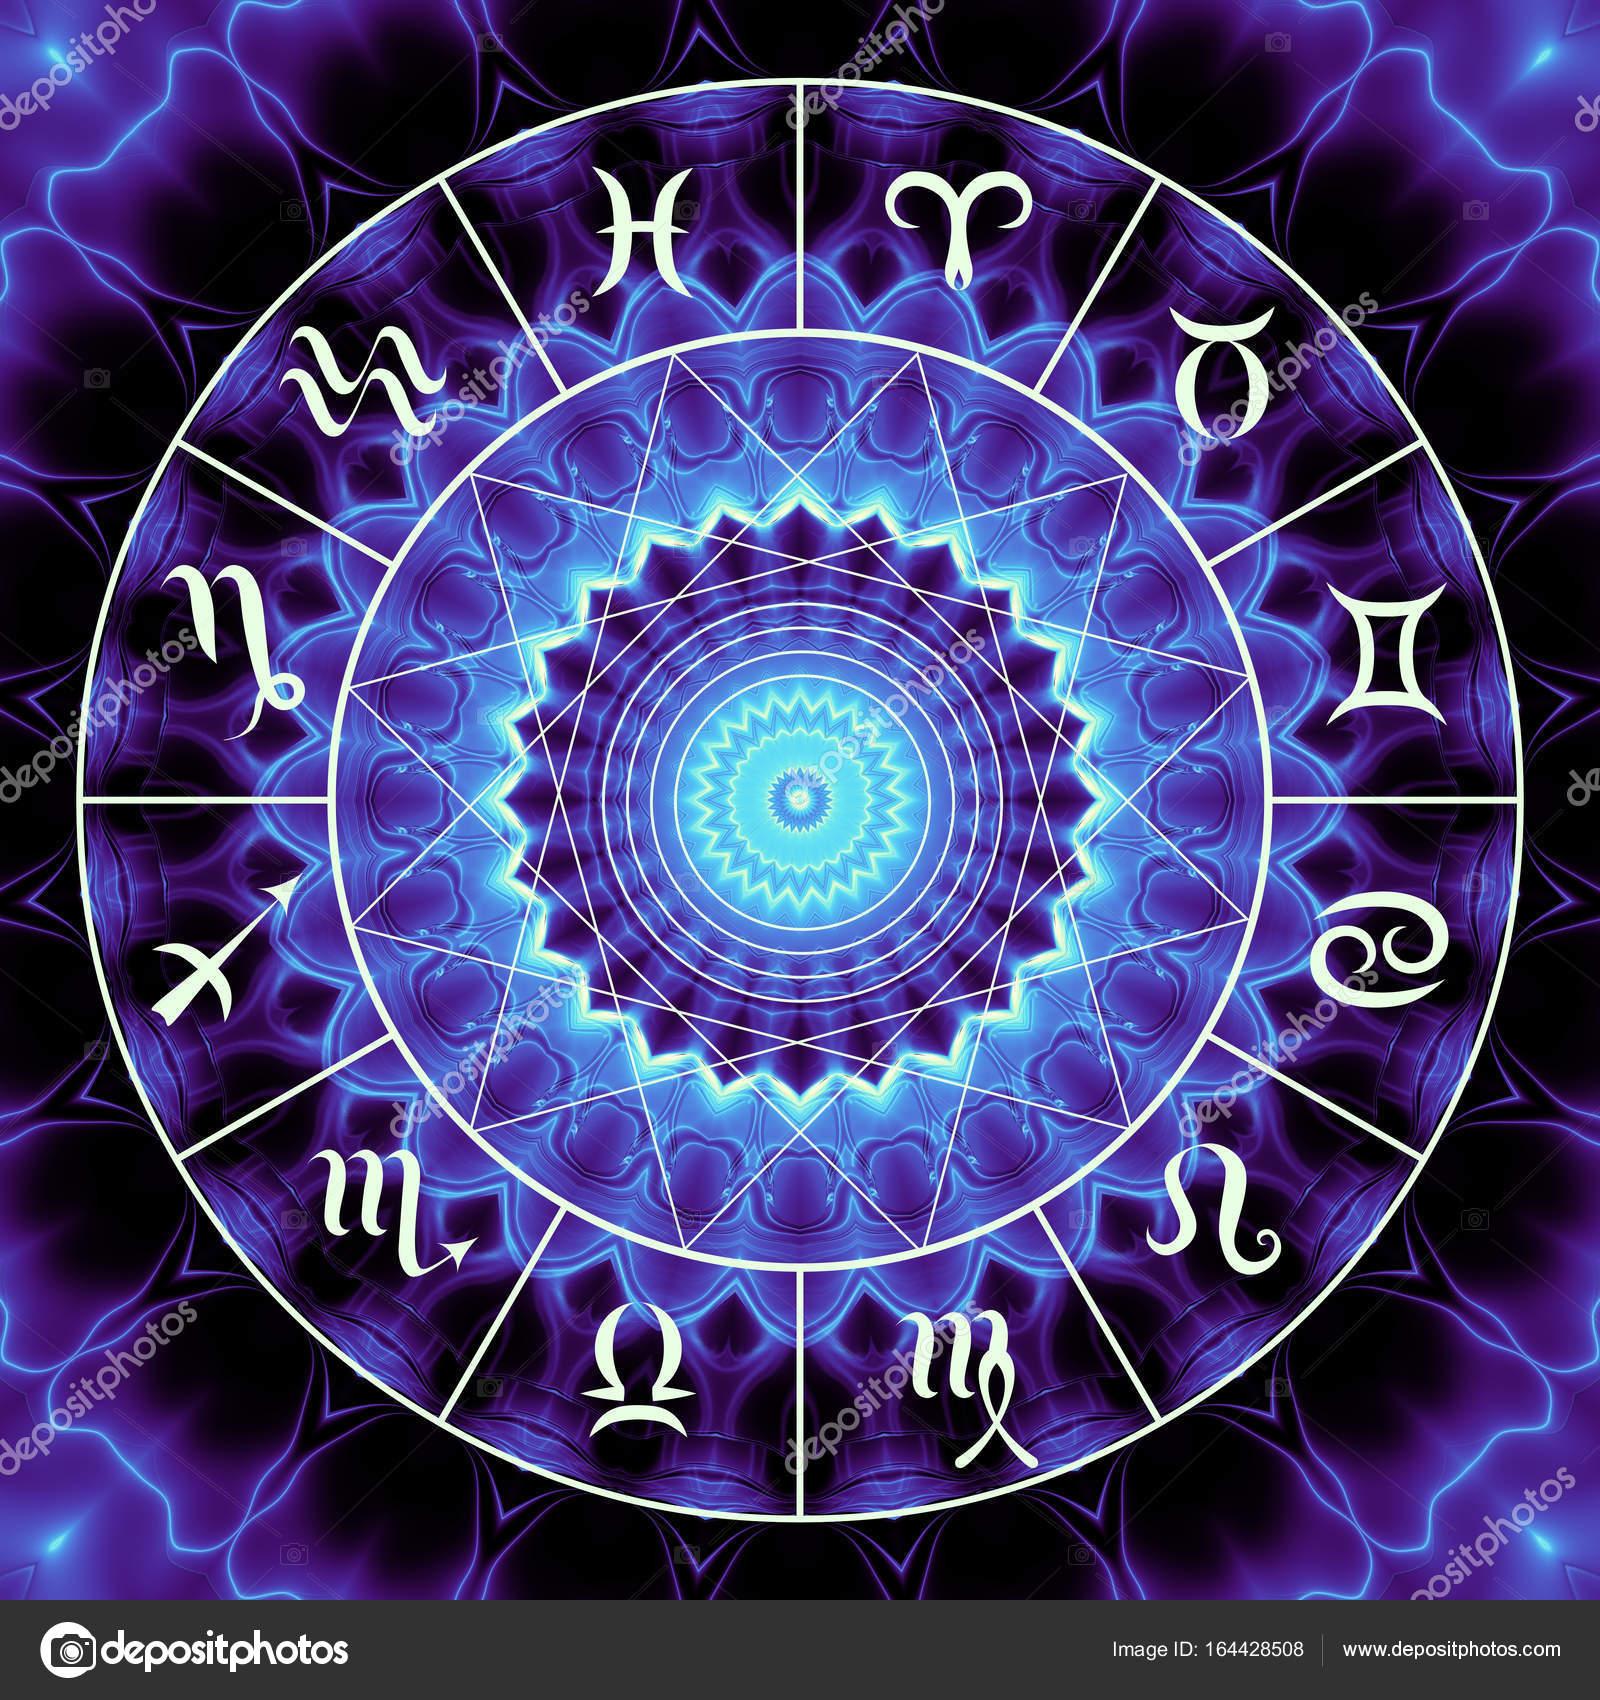 Magic circle horoscope 2019